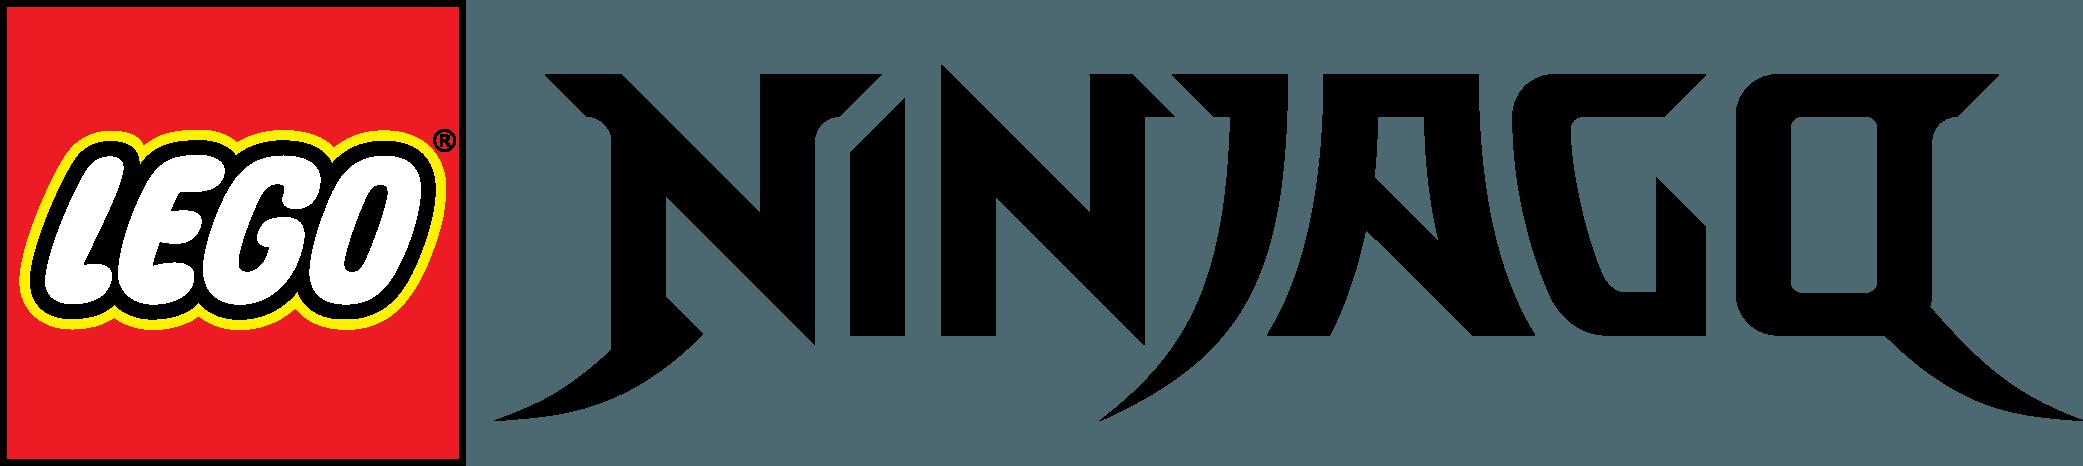 Ninjago logo lego free vector download freelogovectors - Lego ninjago logo ...